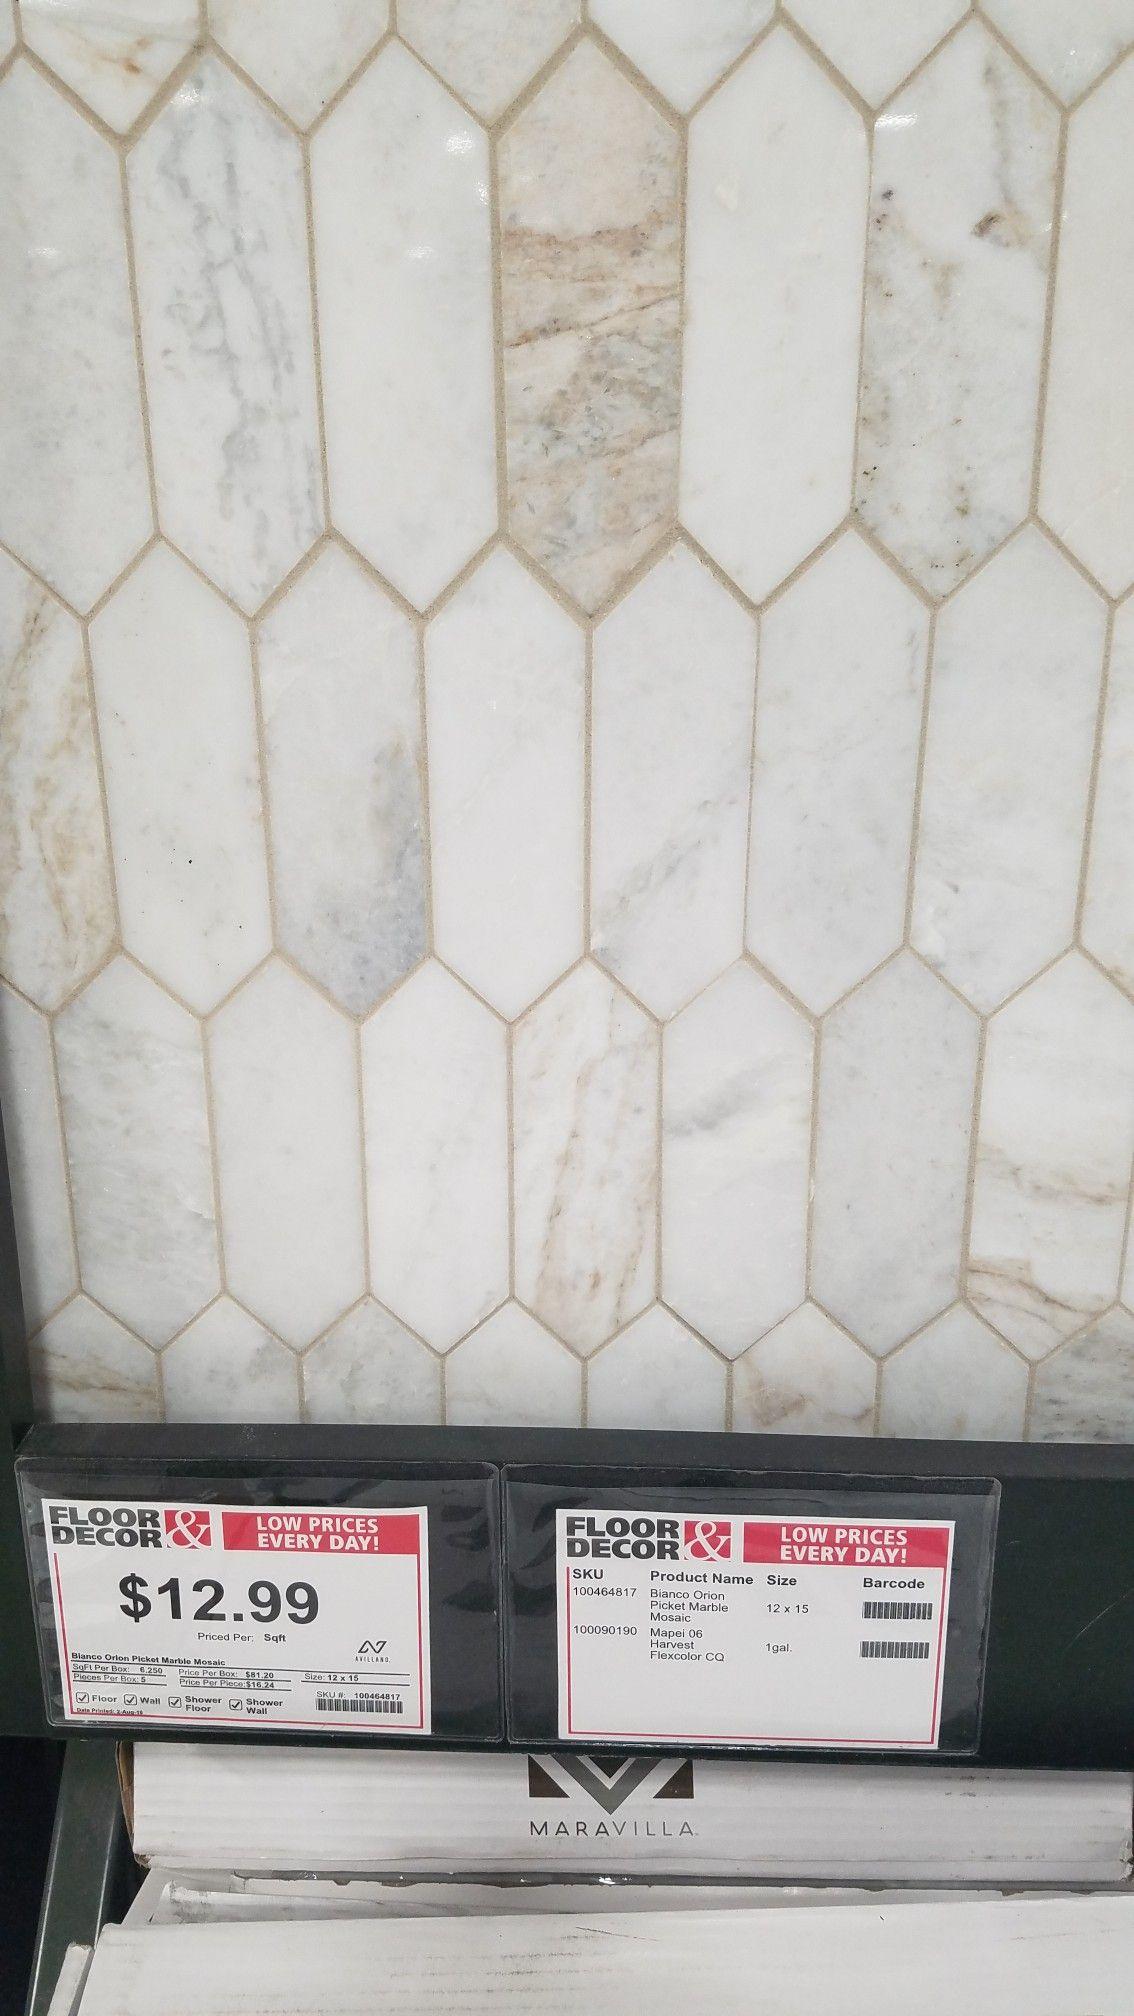 Shower Wall Tile In 2020 Floor Decor Kitchen Backsplash Flooring